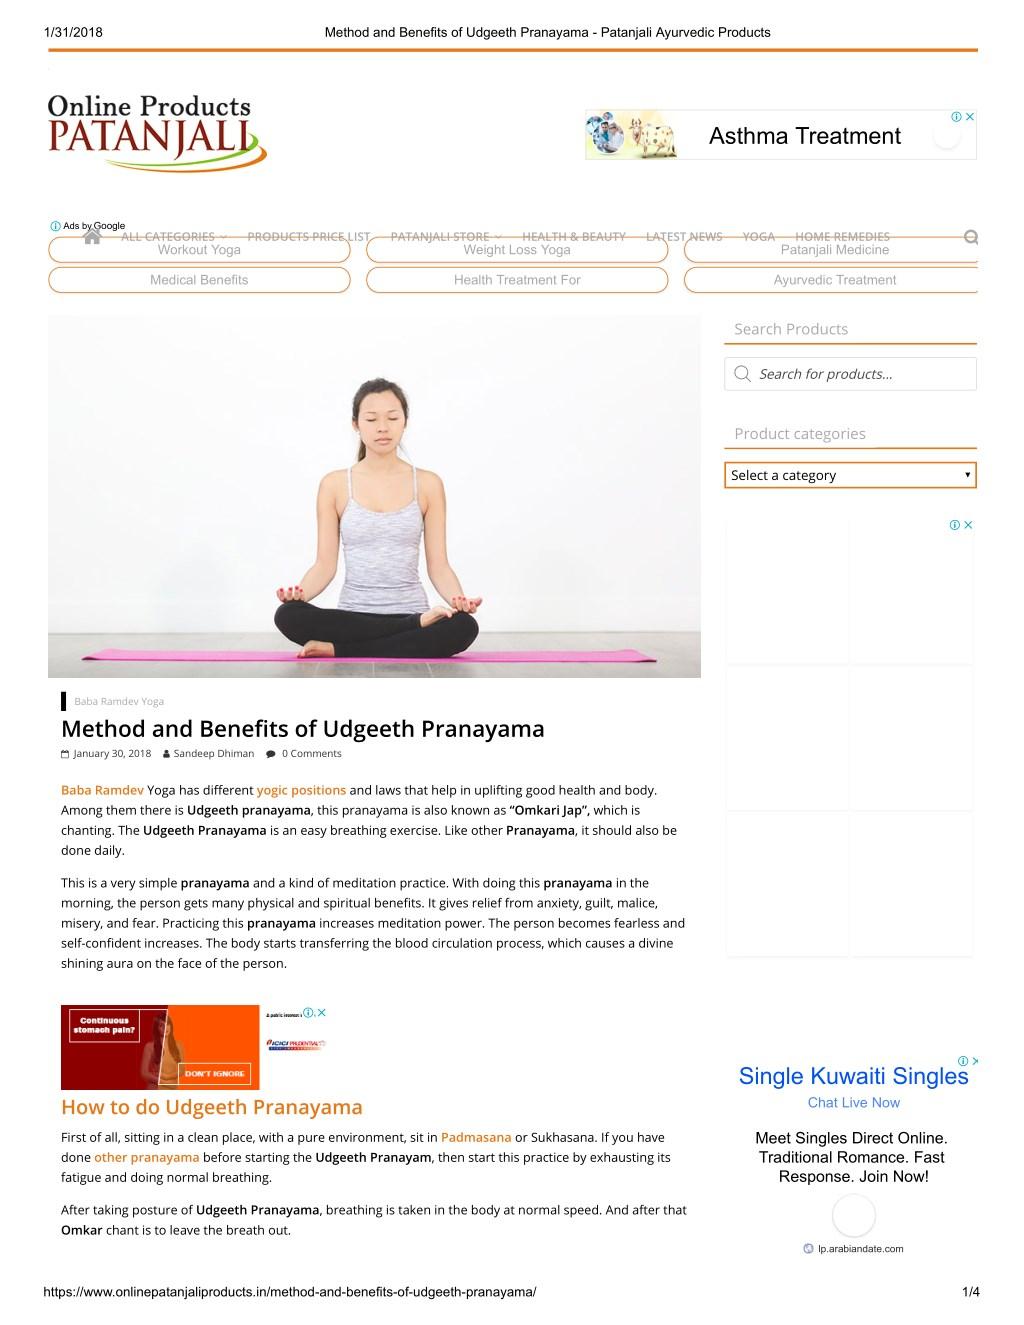 PPT - Method and benefits of udgeeth pranayama patanjali ayurvedic